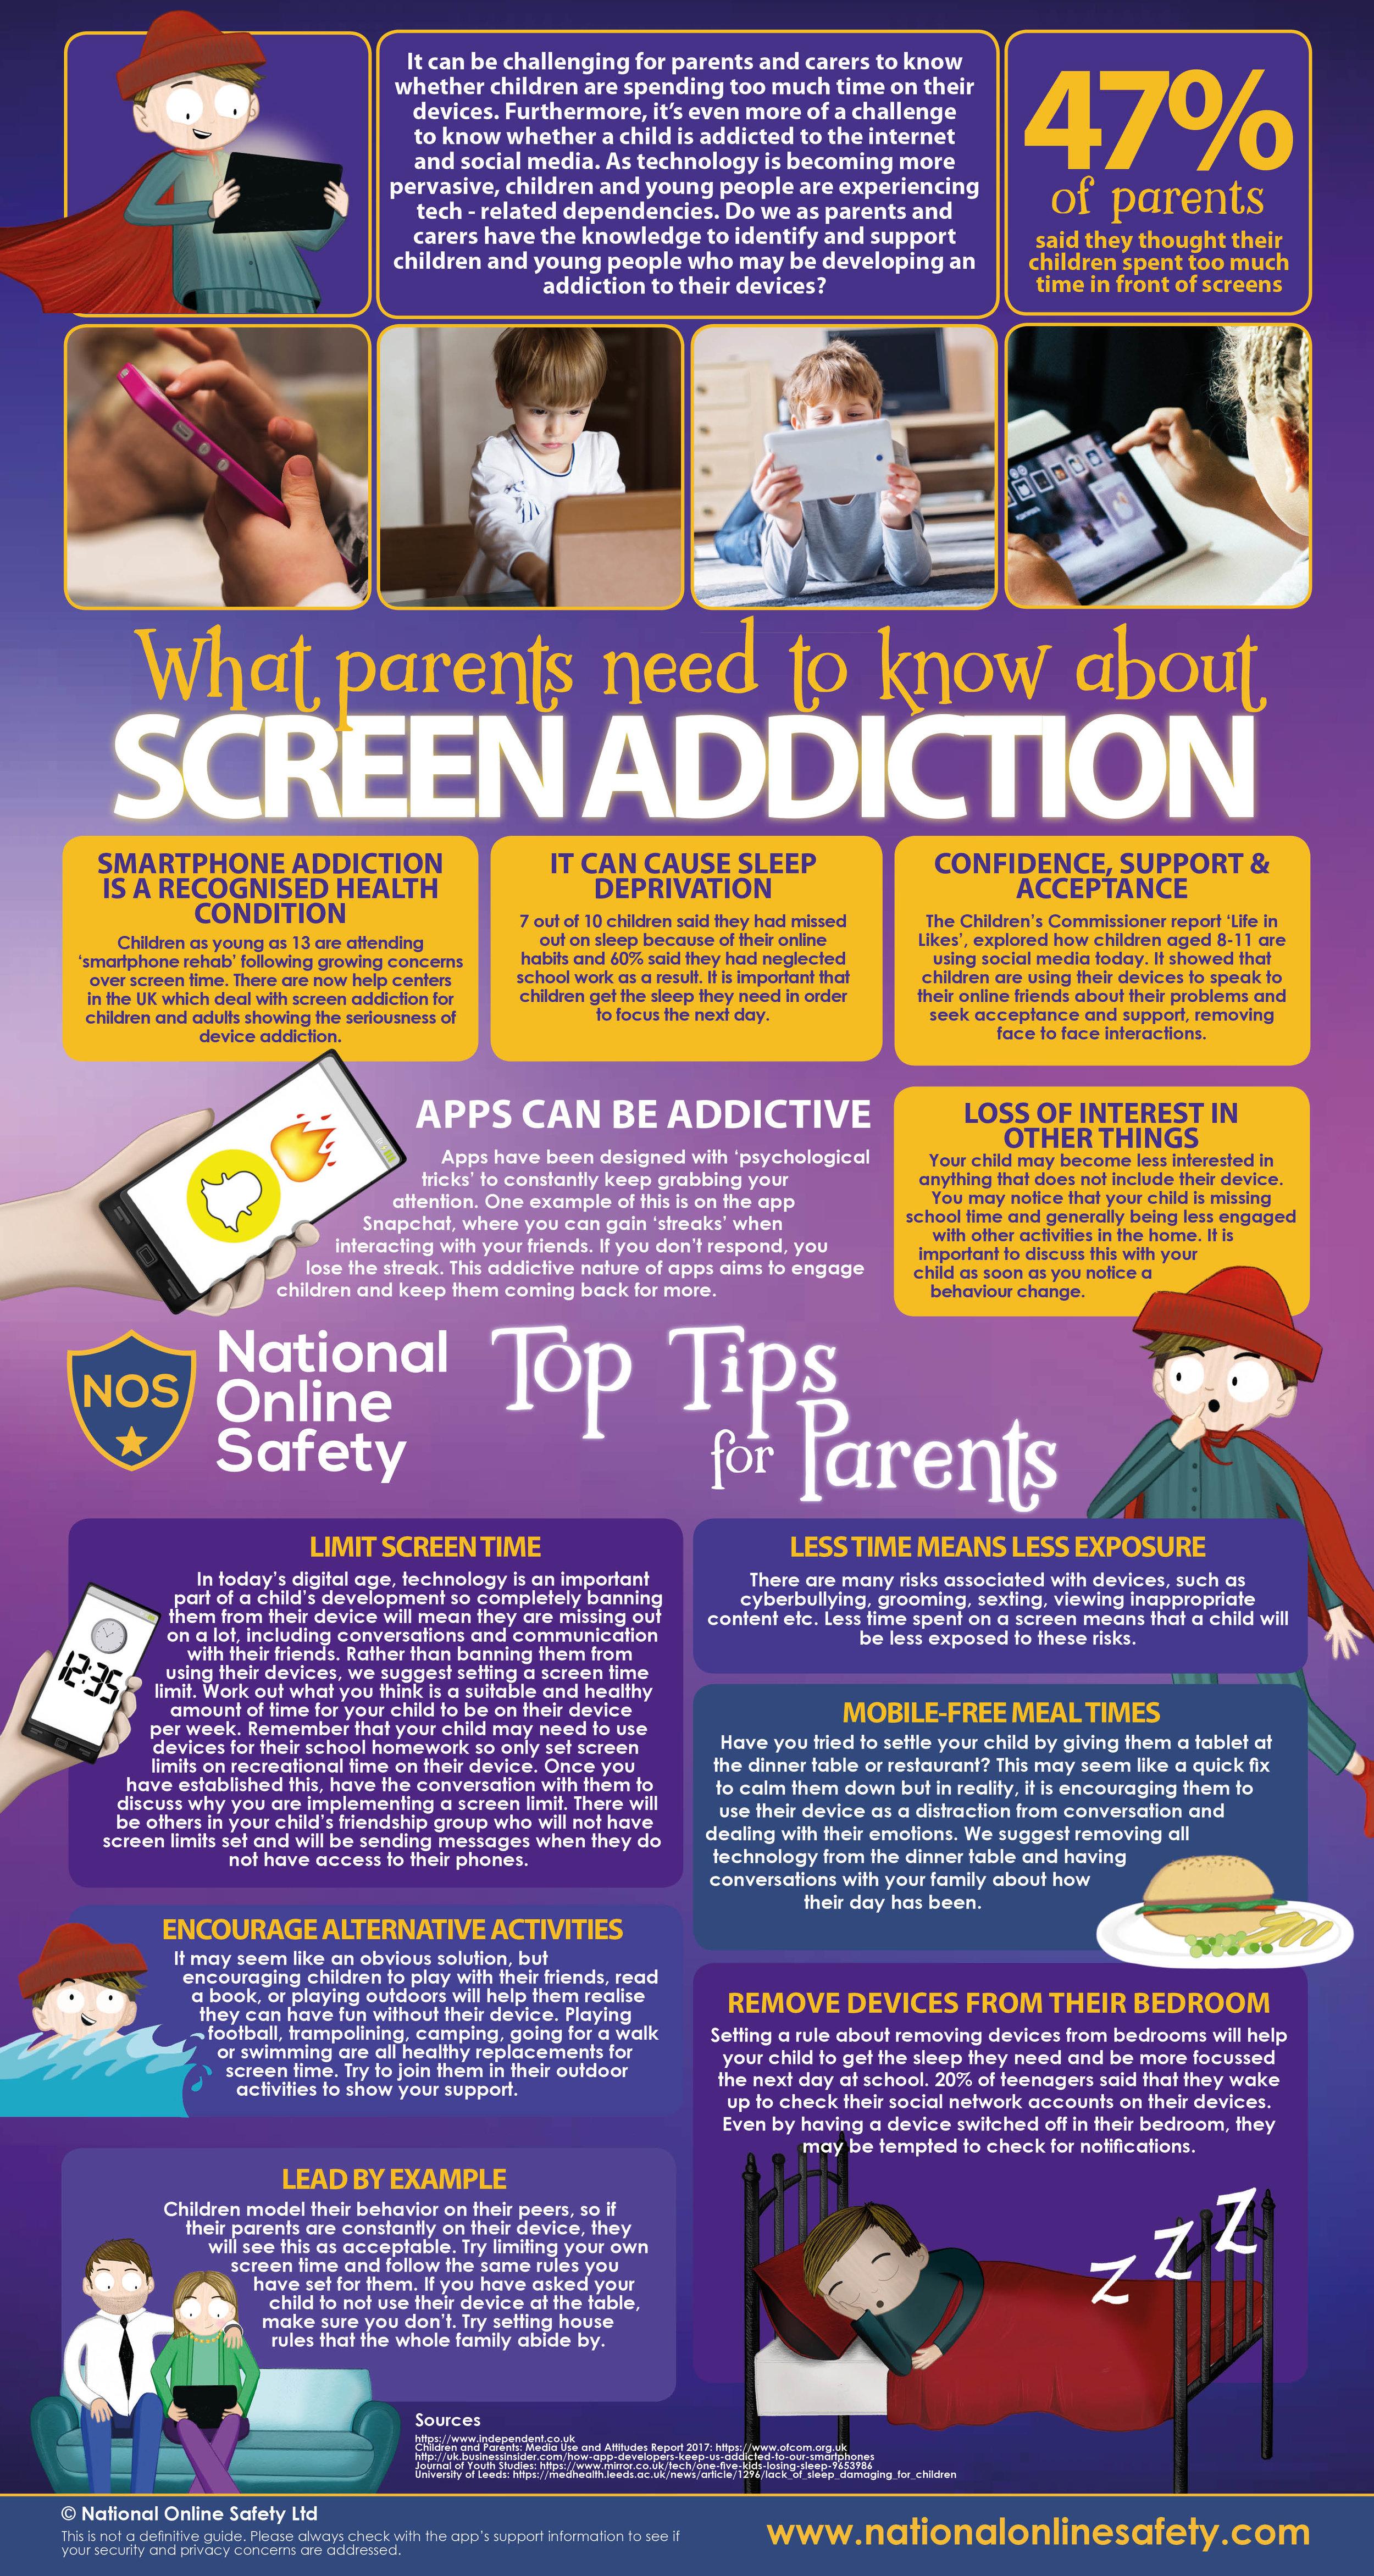 Screen-Addiction-Guide-May-2018.jpg